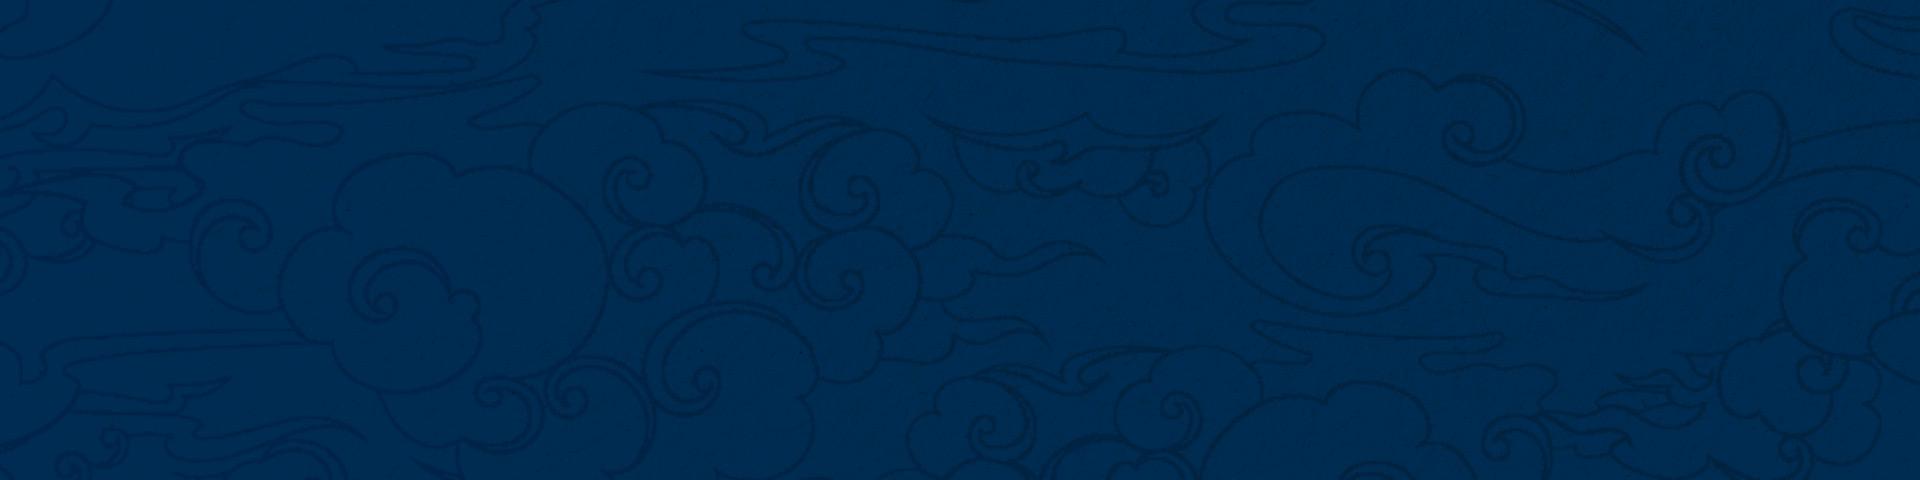 Banner-โปรโมท-คู่กิเลนค้ำบัลลังก์-BG